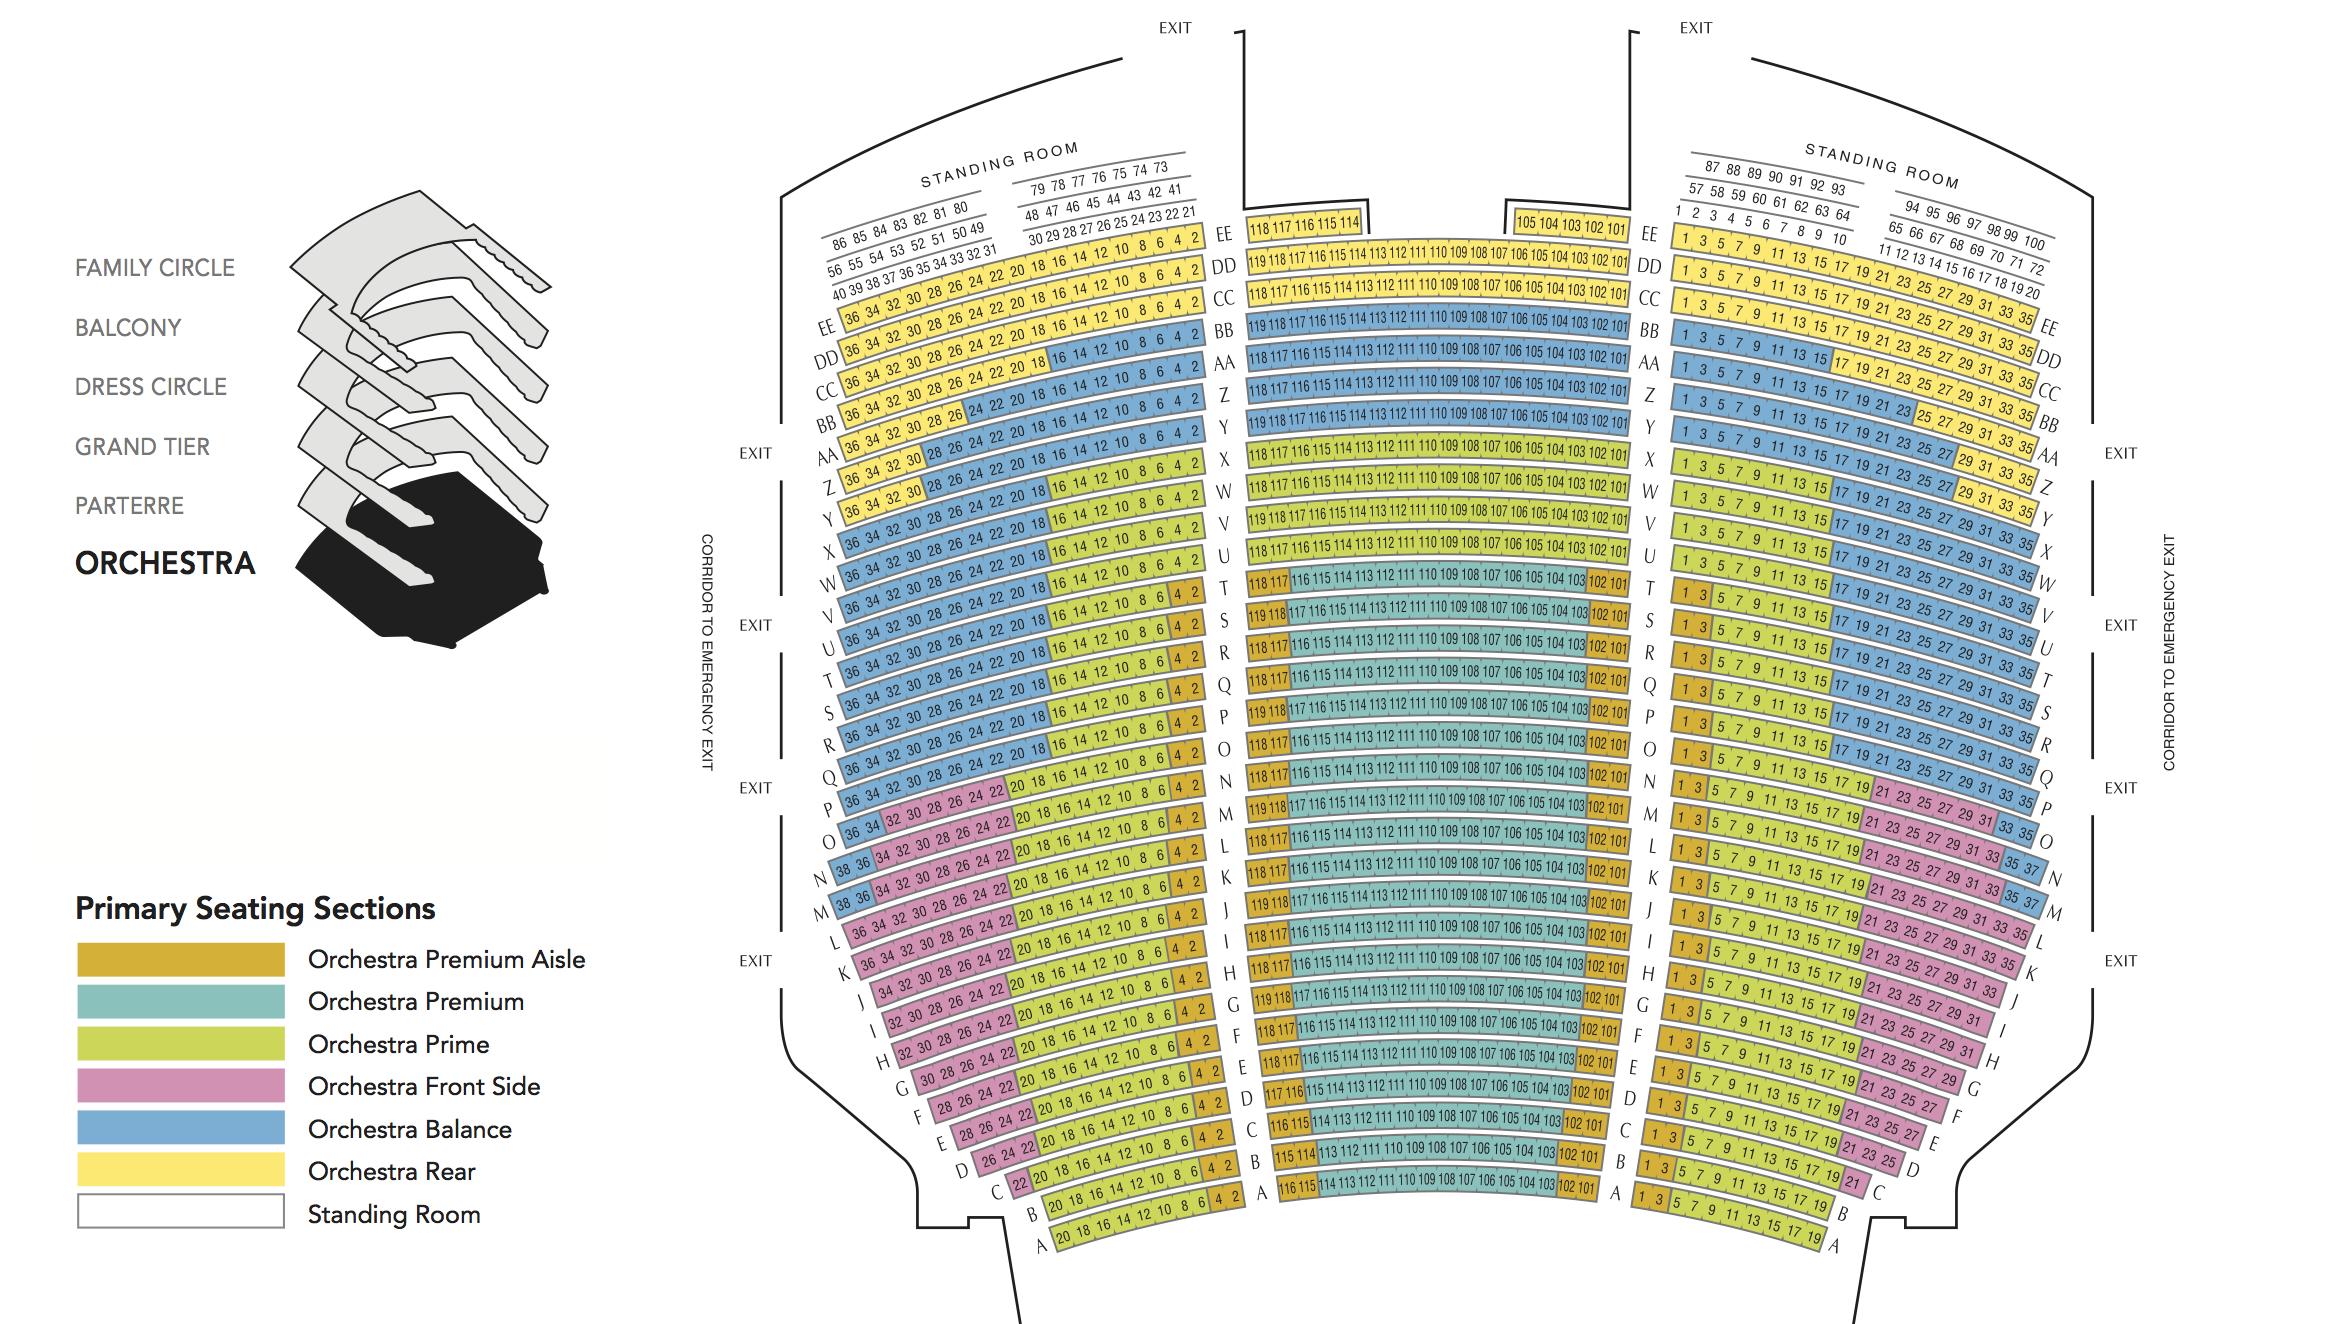 Metropolitan opera seating chart hobit fullring co